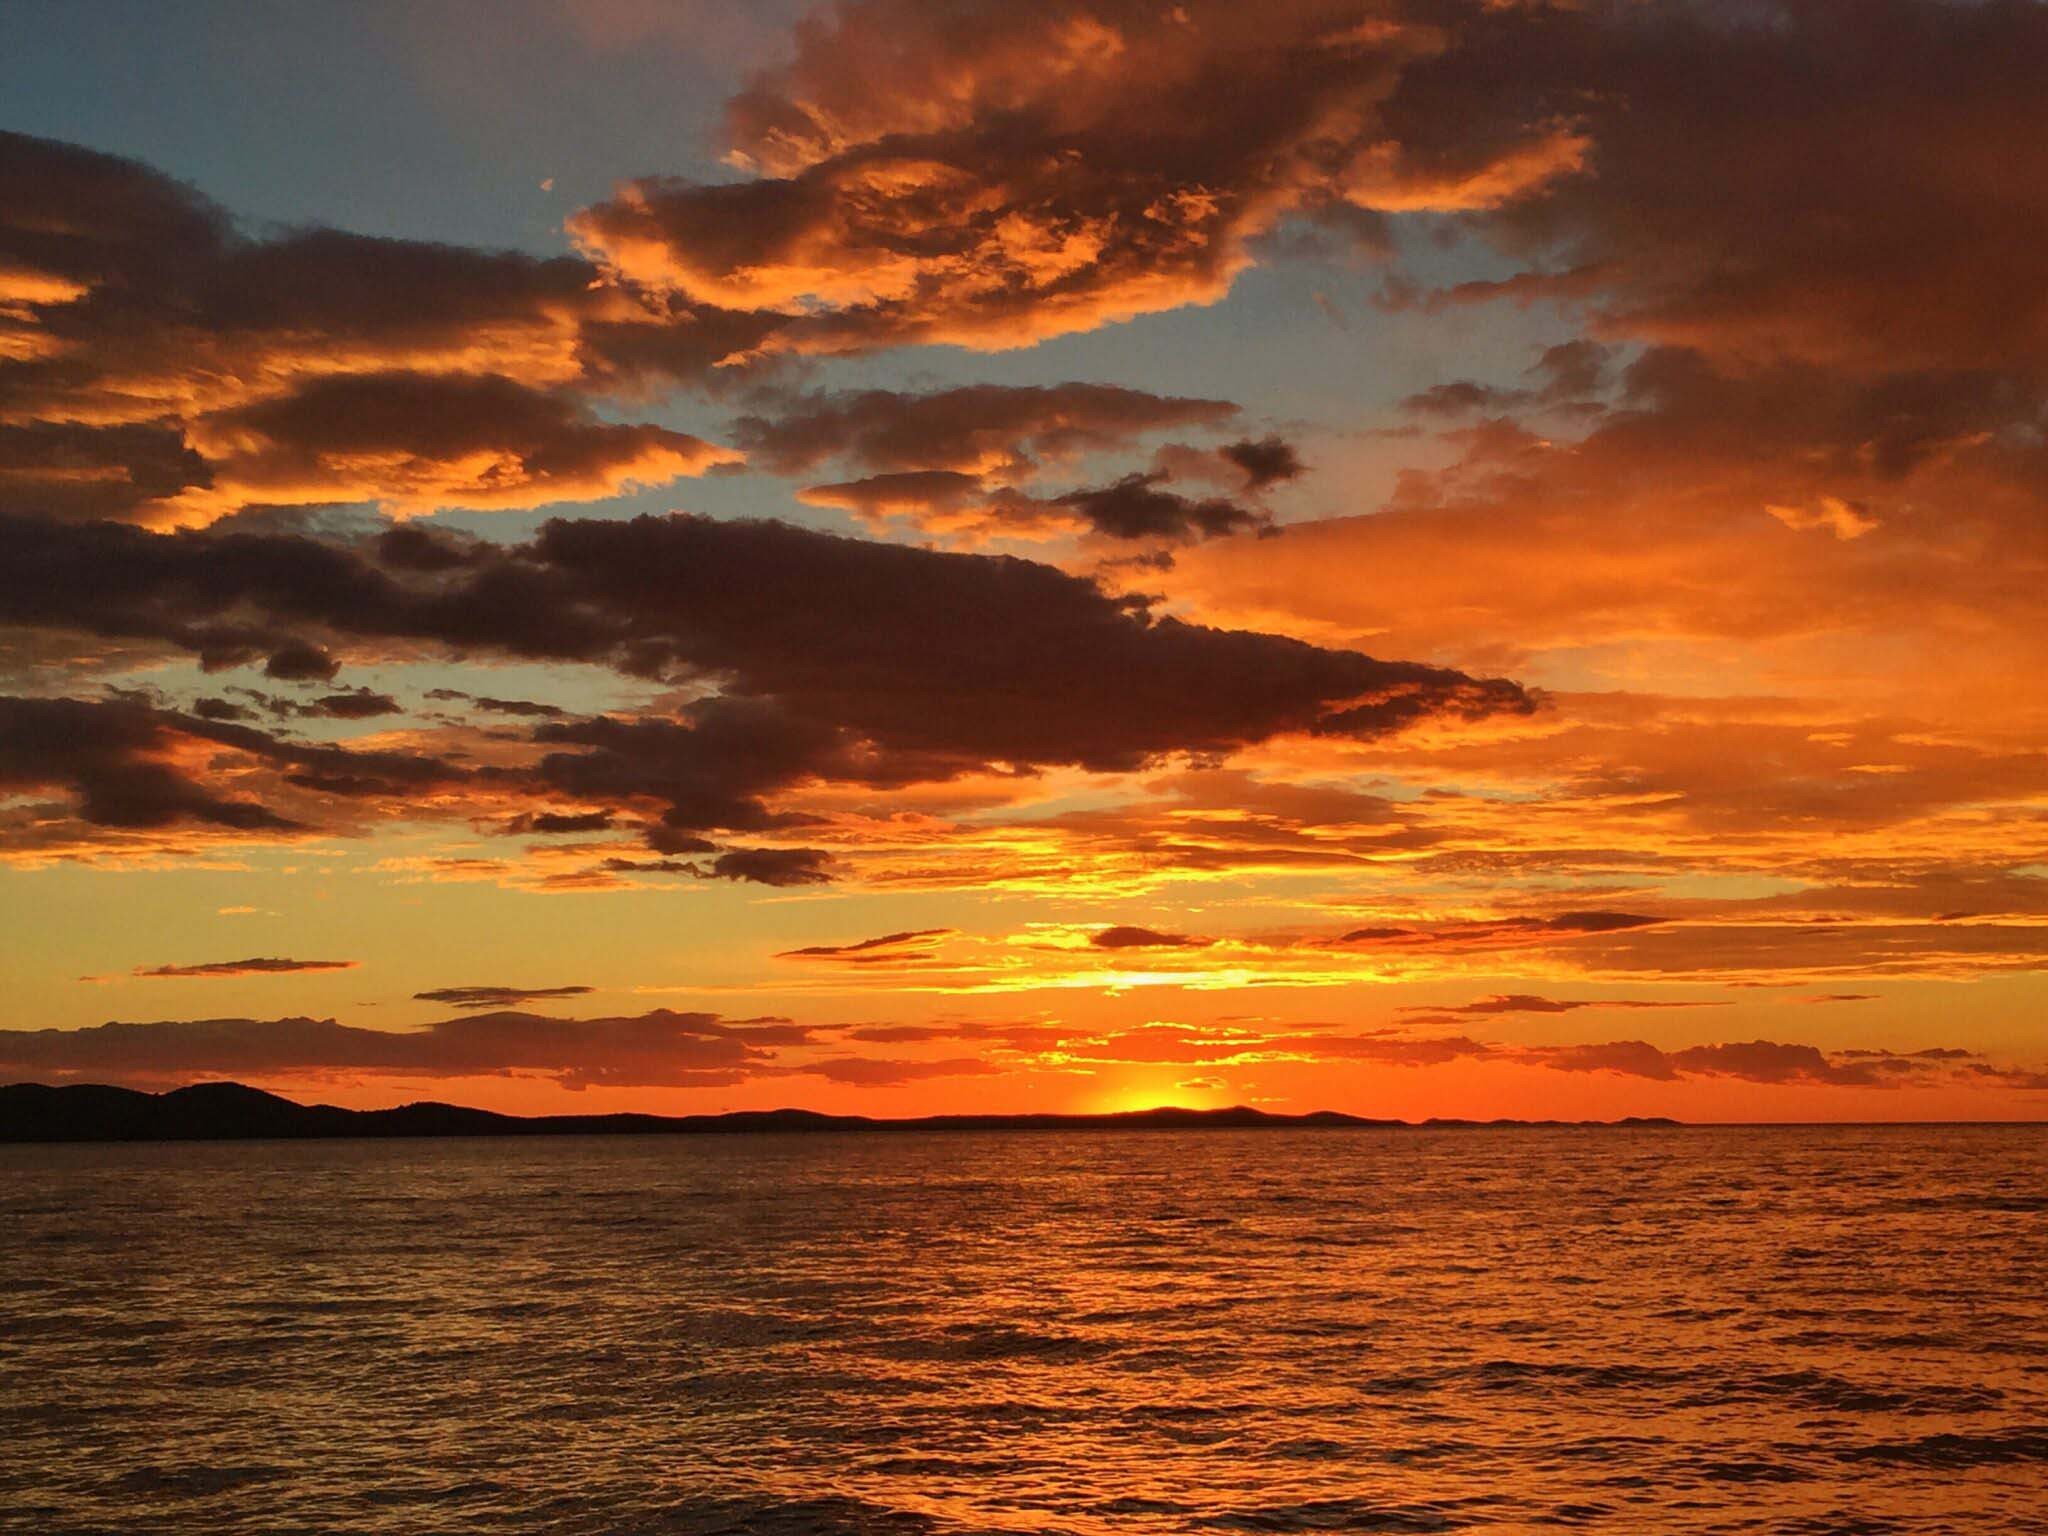 7 reasons for visiting Zadar this summer